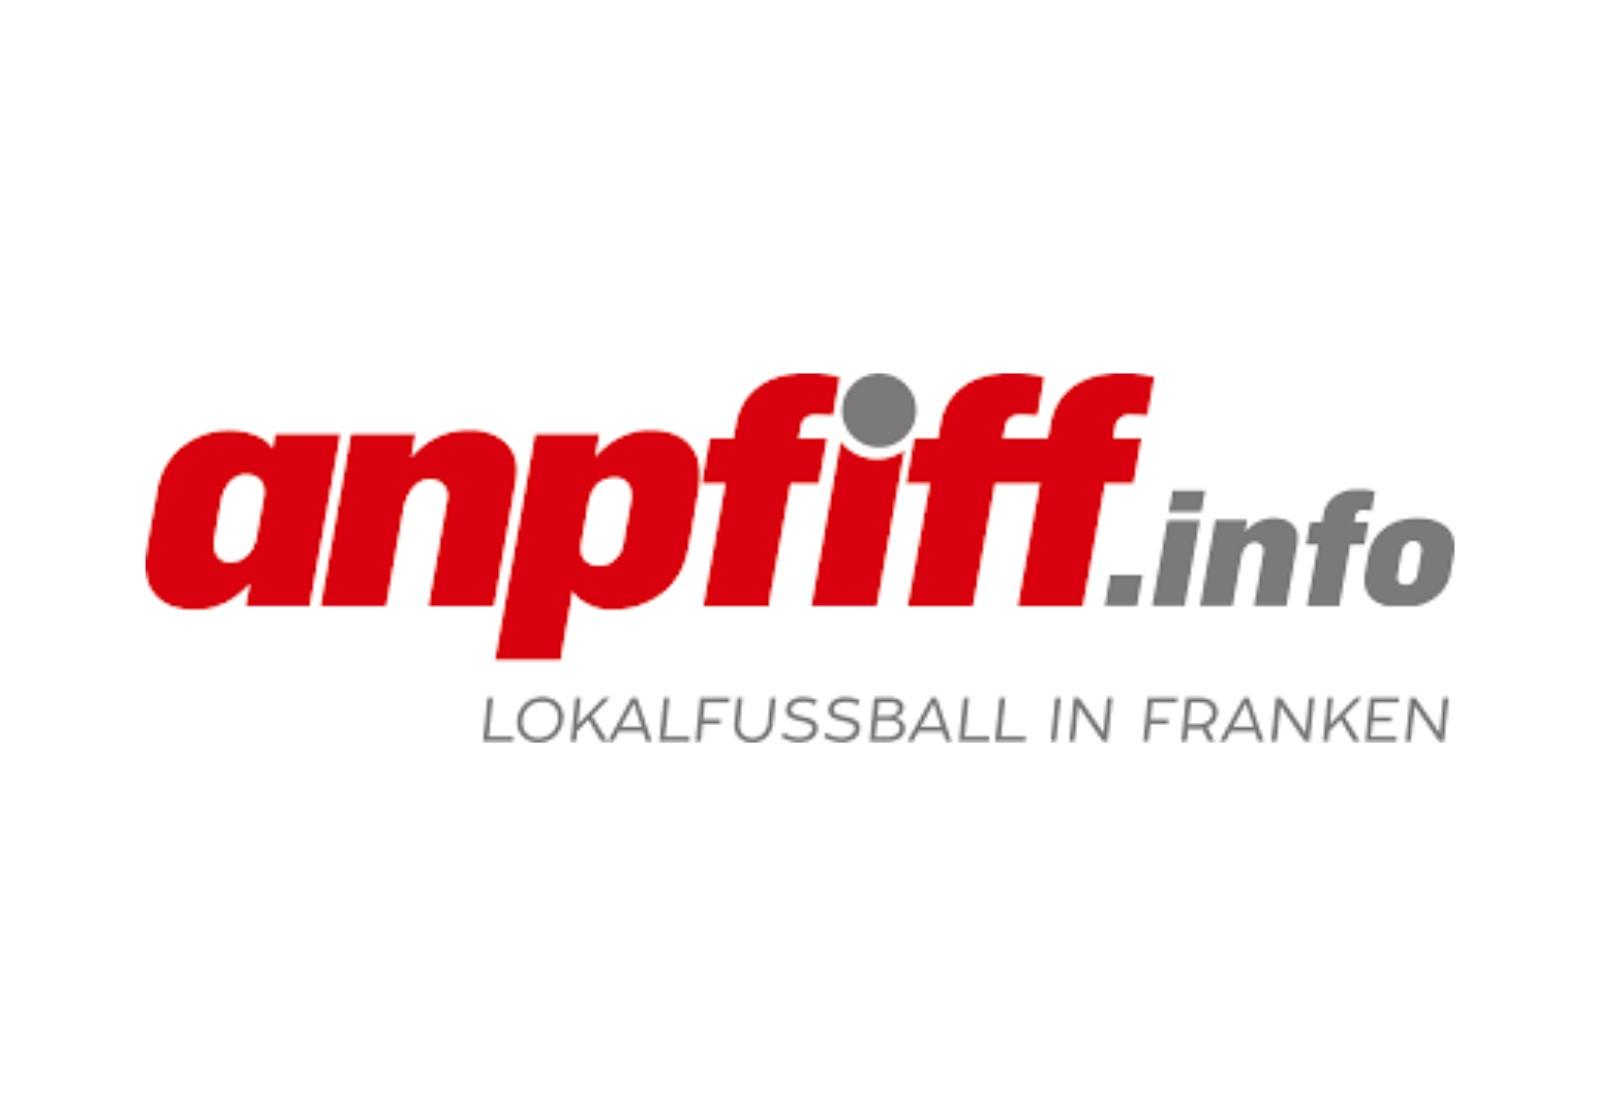 anpfiff.info